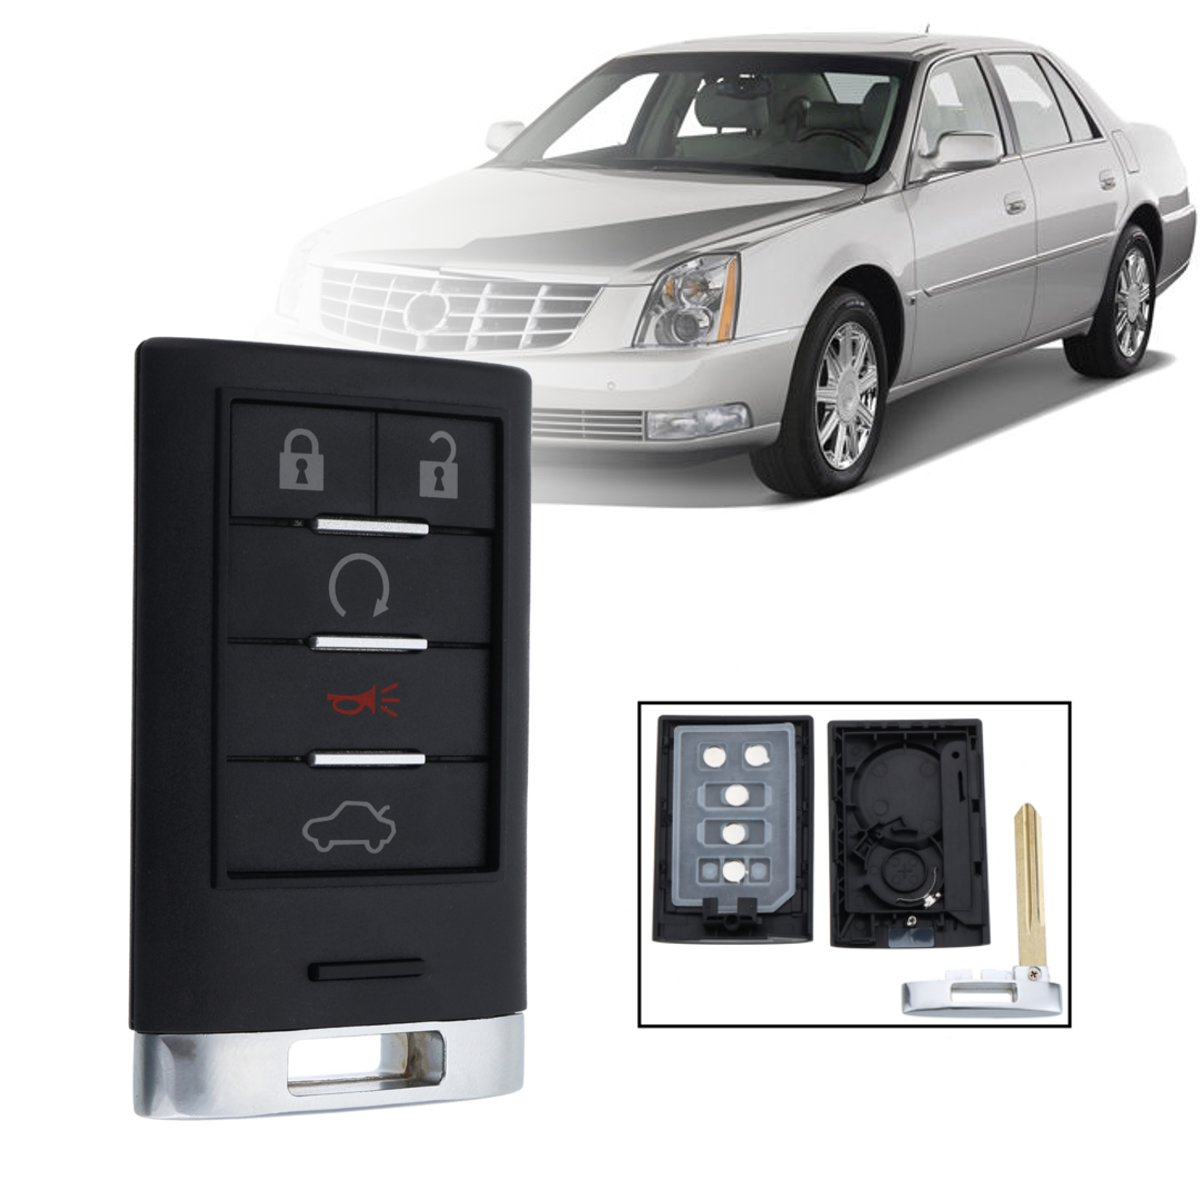 5 Кнопка Дистанционный Key Fob Keyless Entry Shell C Клинок для Cadillac CTS DTS STS XTS - фото 1